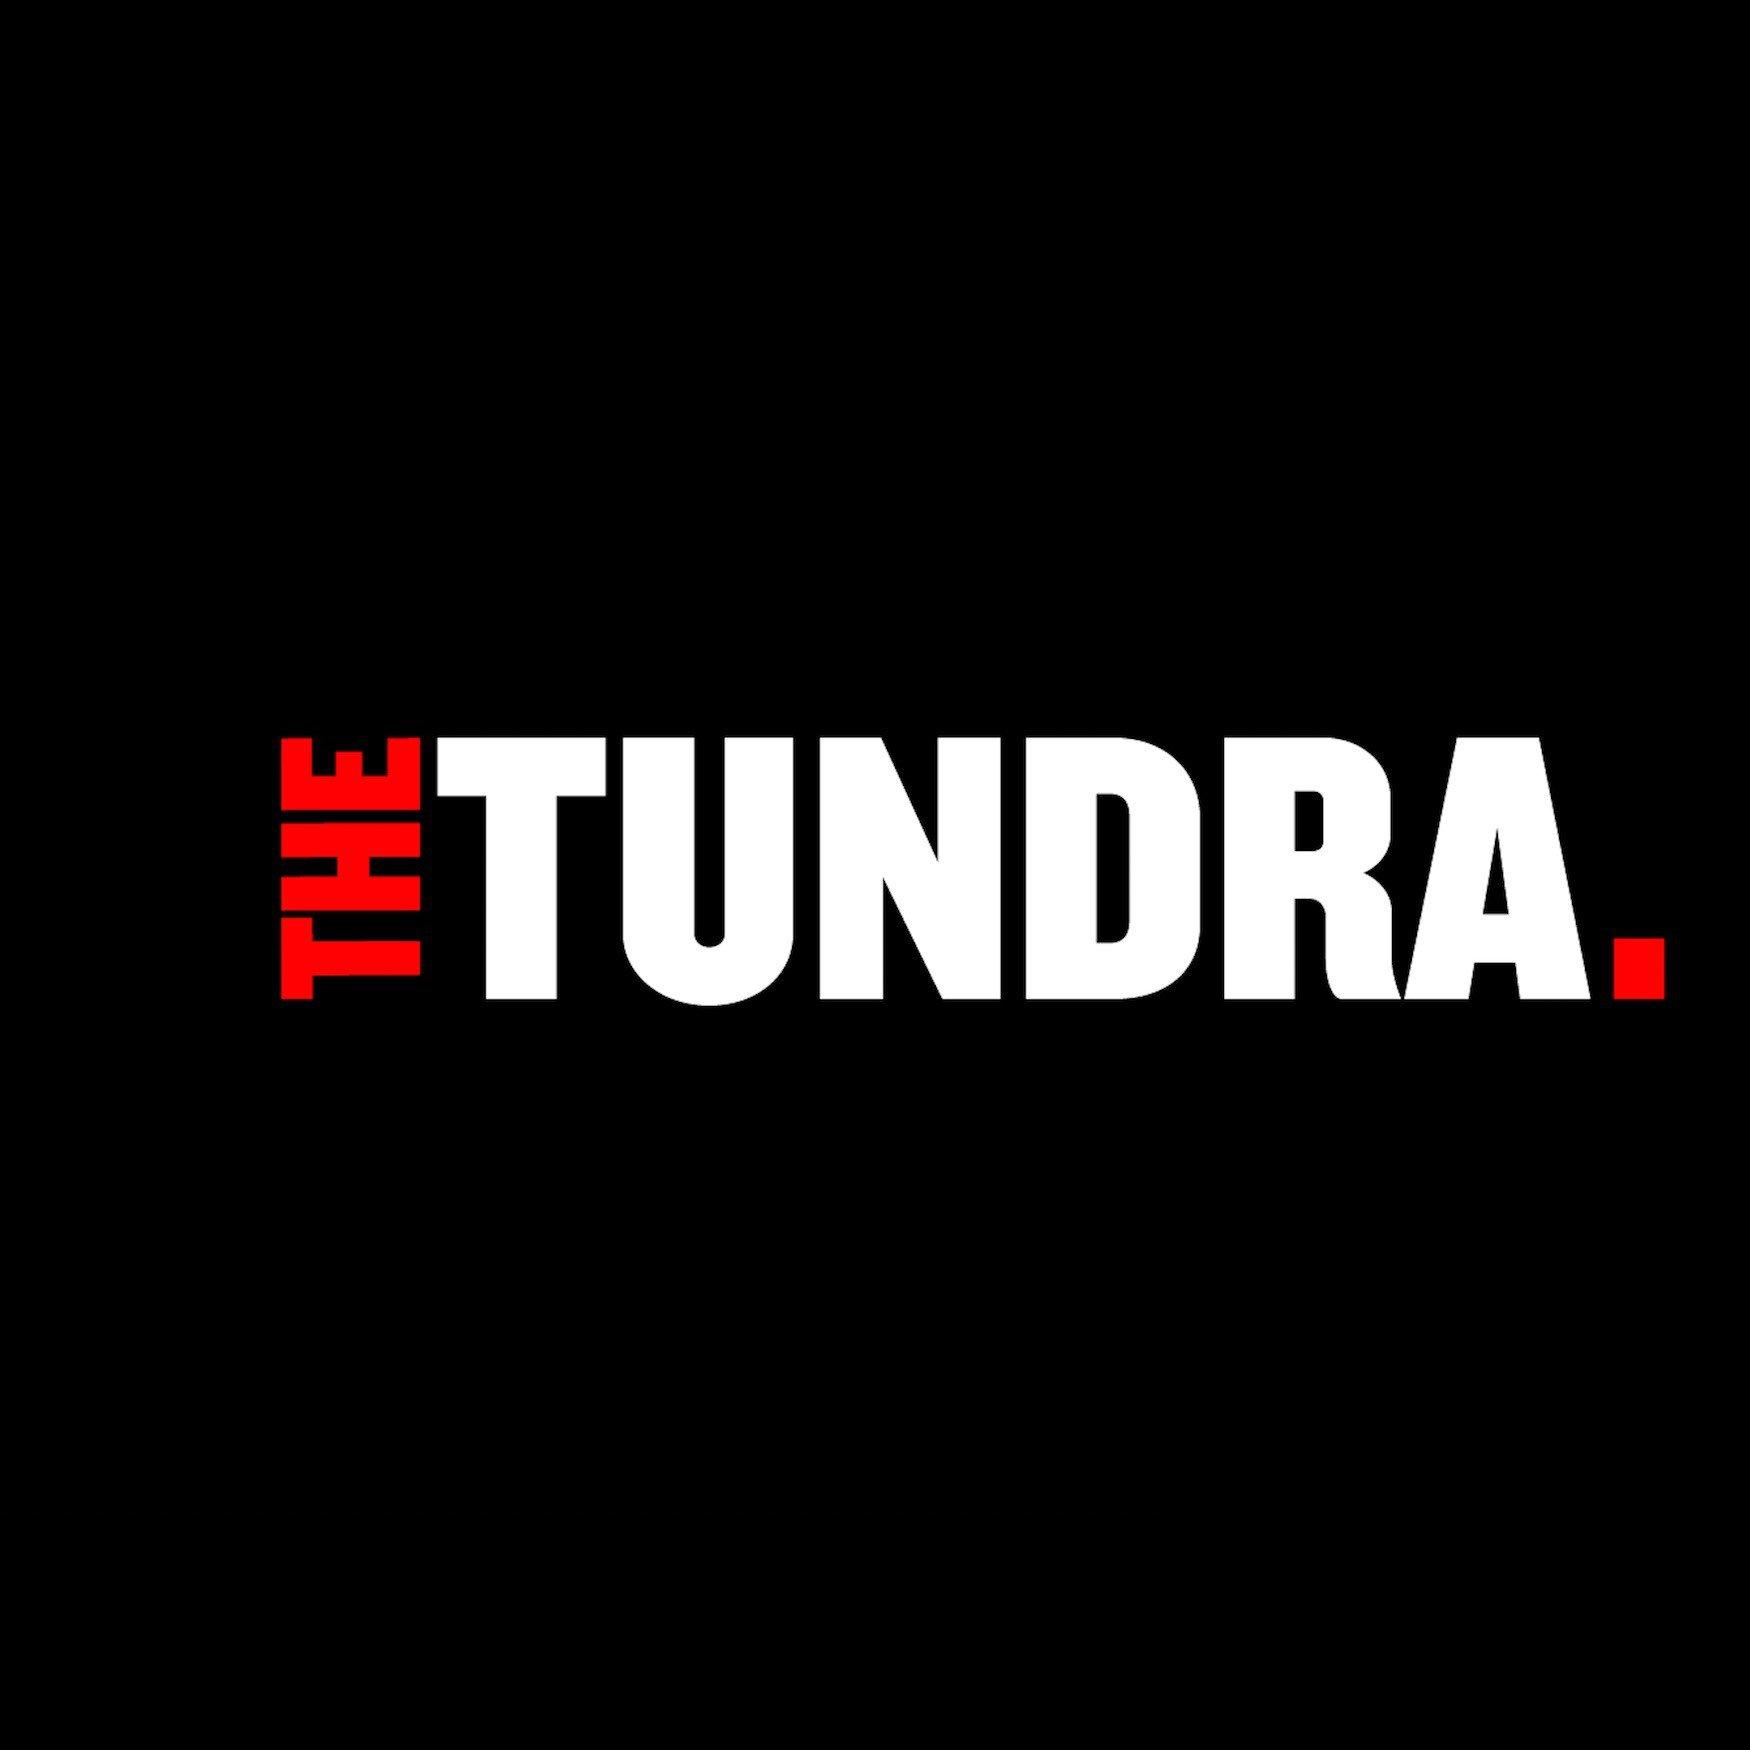 TeamTUNDRA